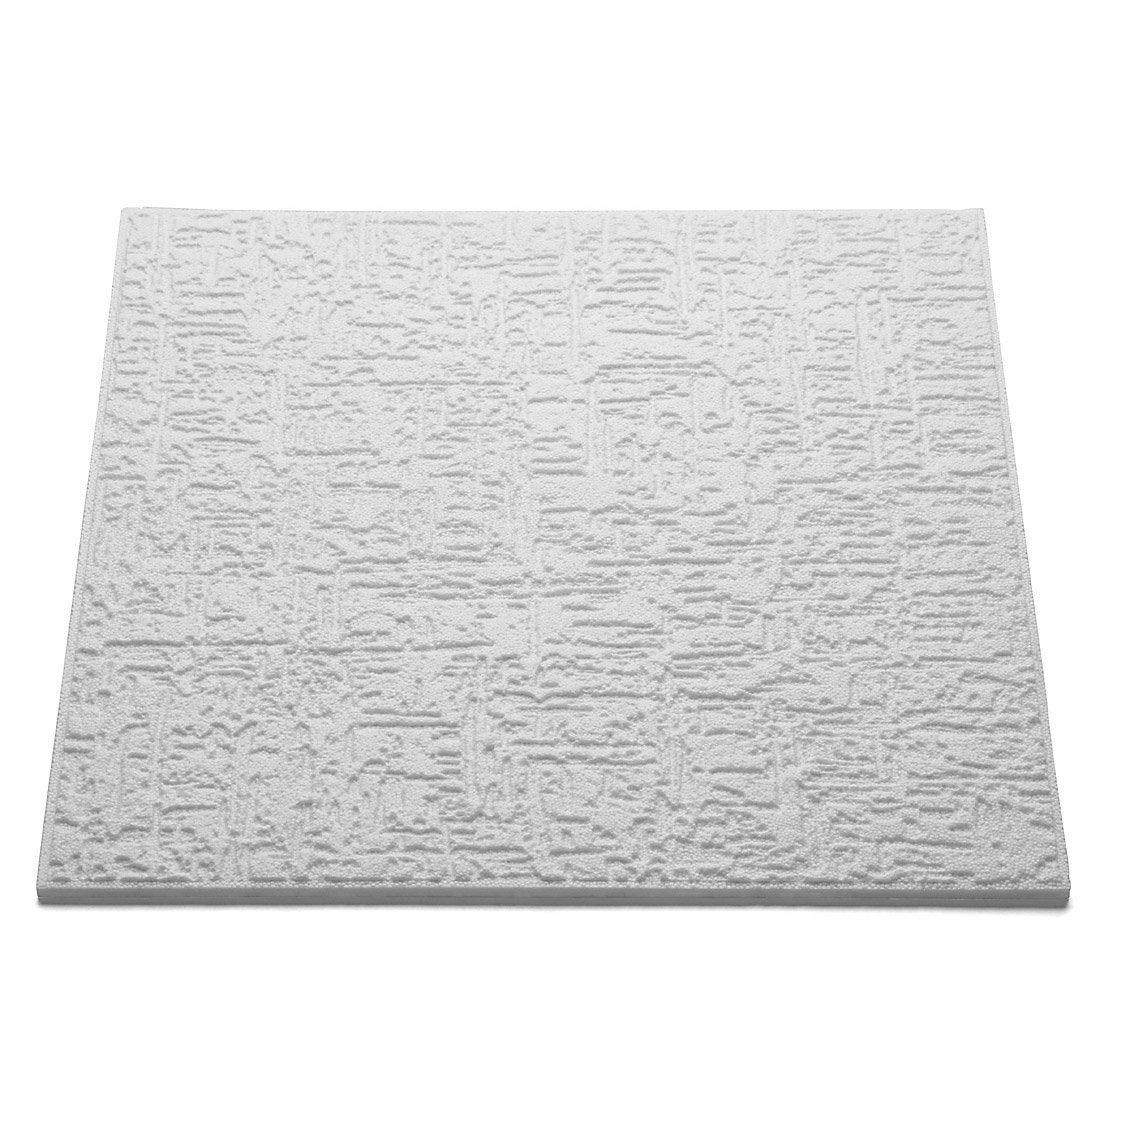 Dalle de plafond t 102 50 x 50 cm p 10 mm polystyr ne - Polystyrene expanse leroy merlin ...